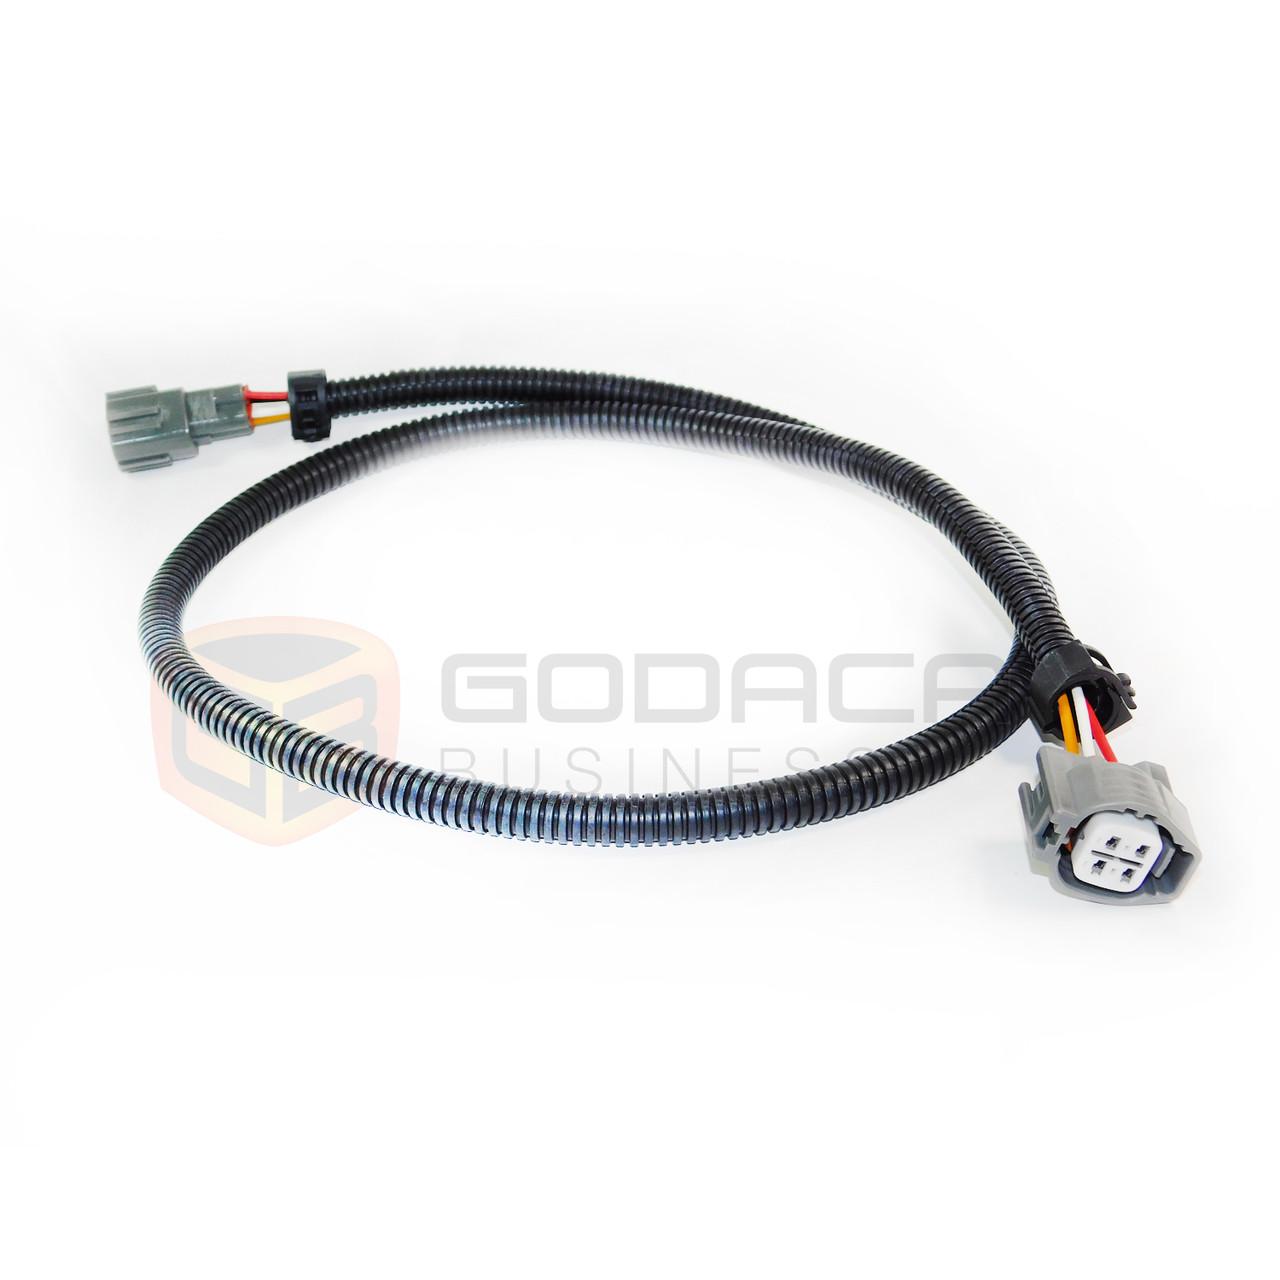 medium resolution of 1x wiring harness extension for toyota o2 oxygen sensor 36 godaca llc